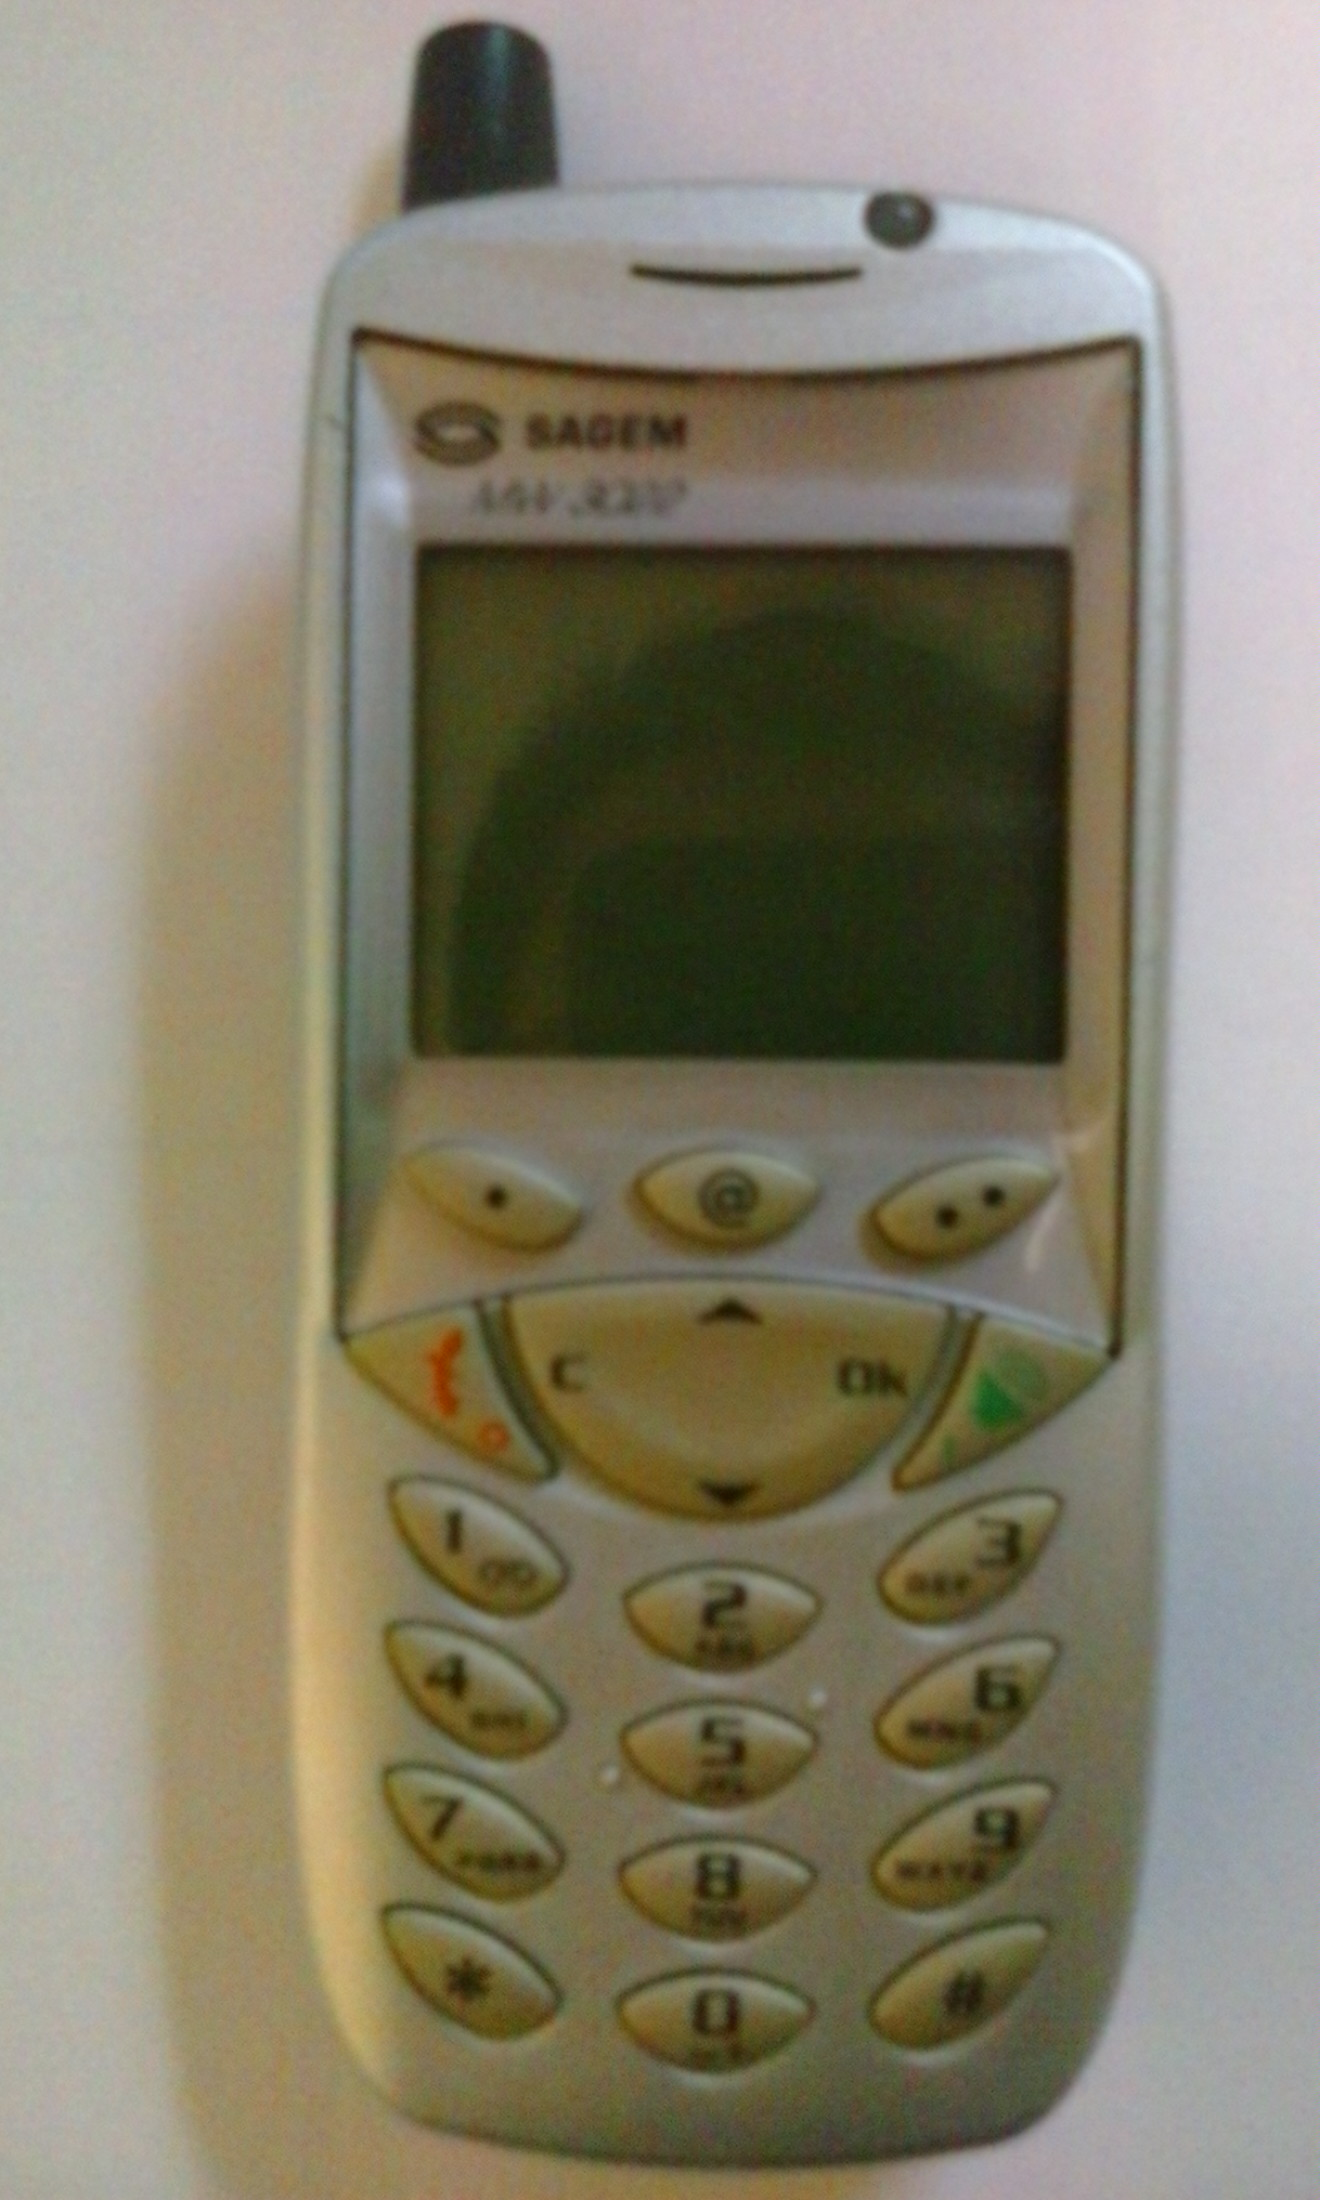 Sagem 3022 - Cellphone